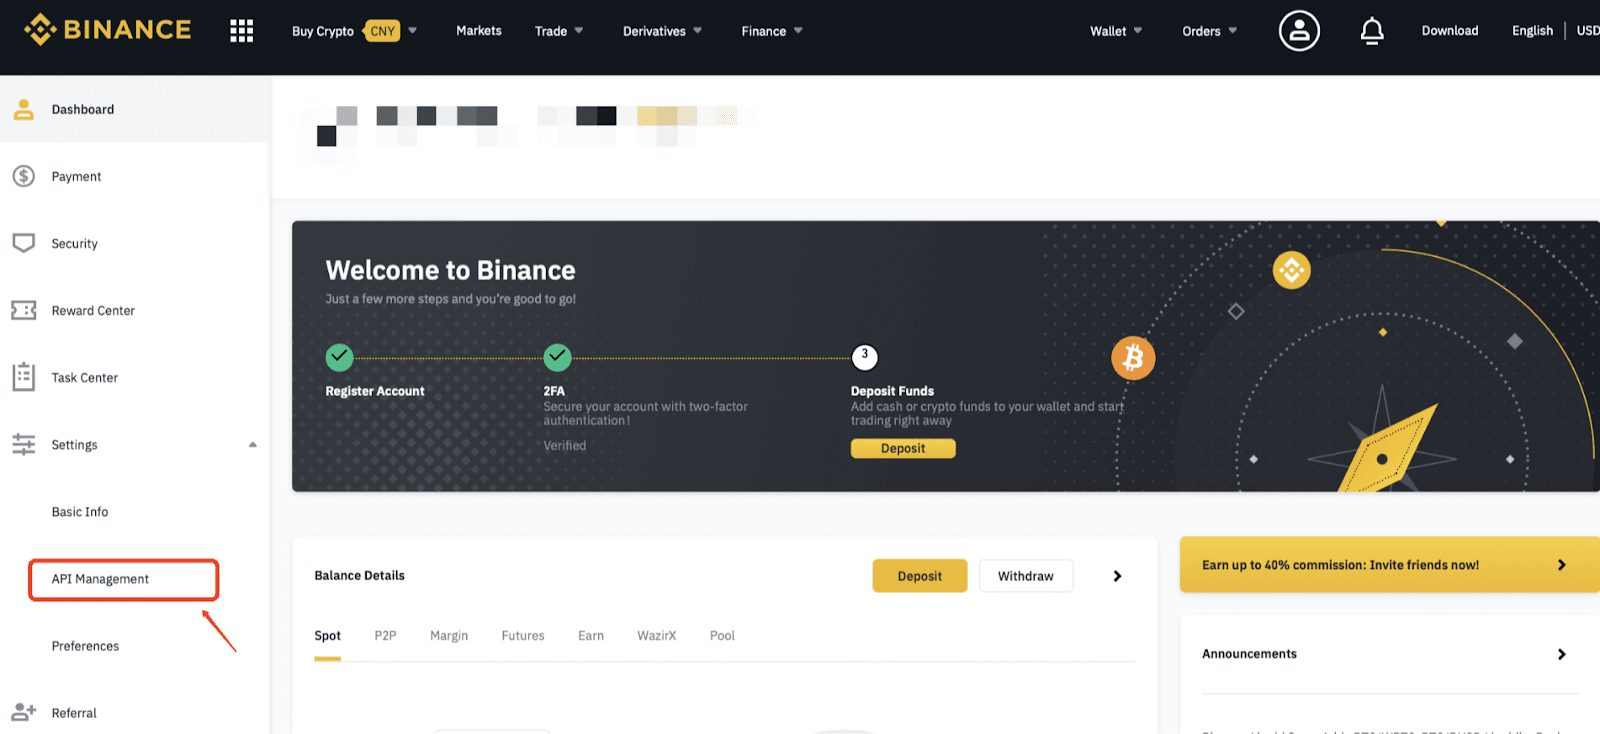 convertiți bitcoins în dolari binance